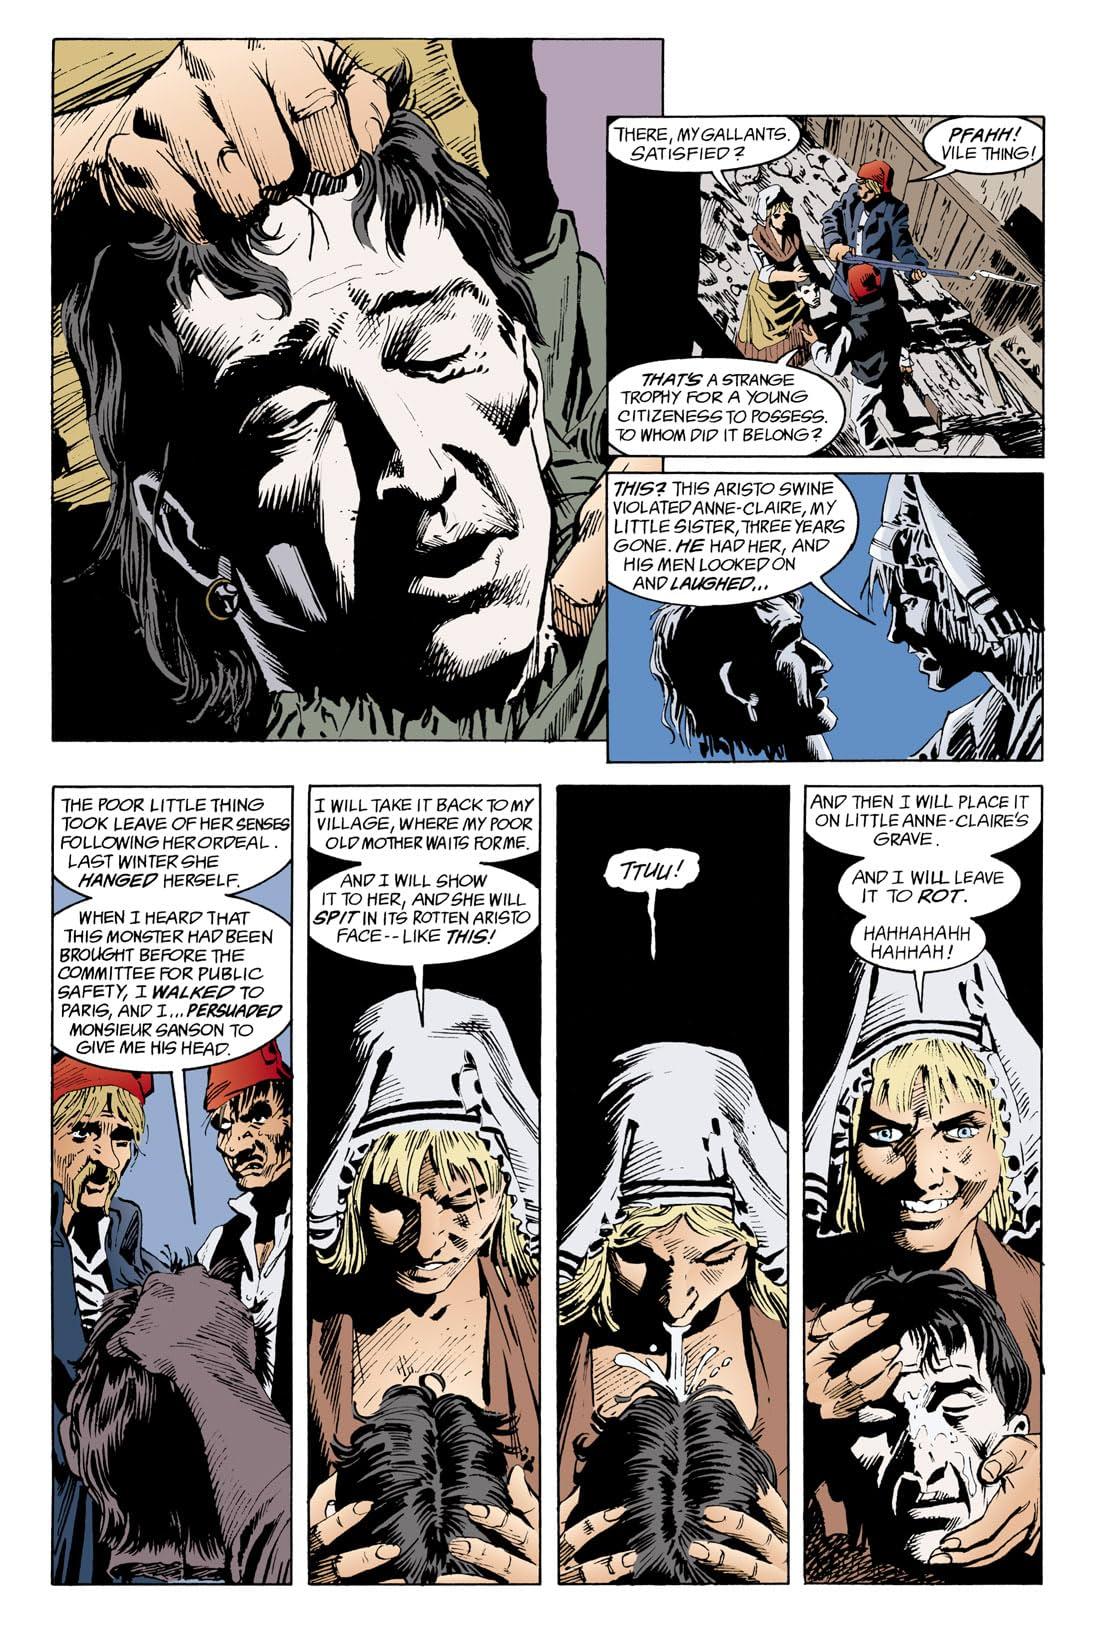 The Sandman #29